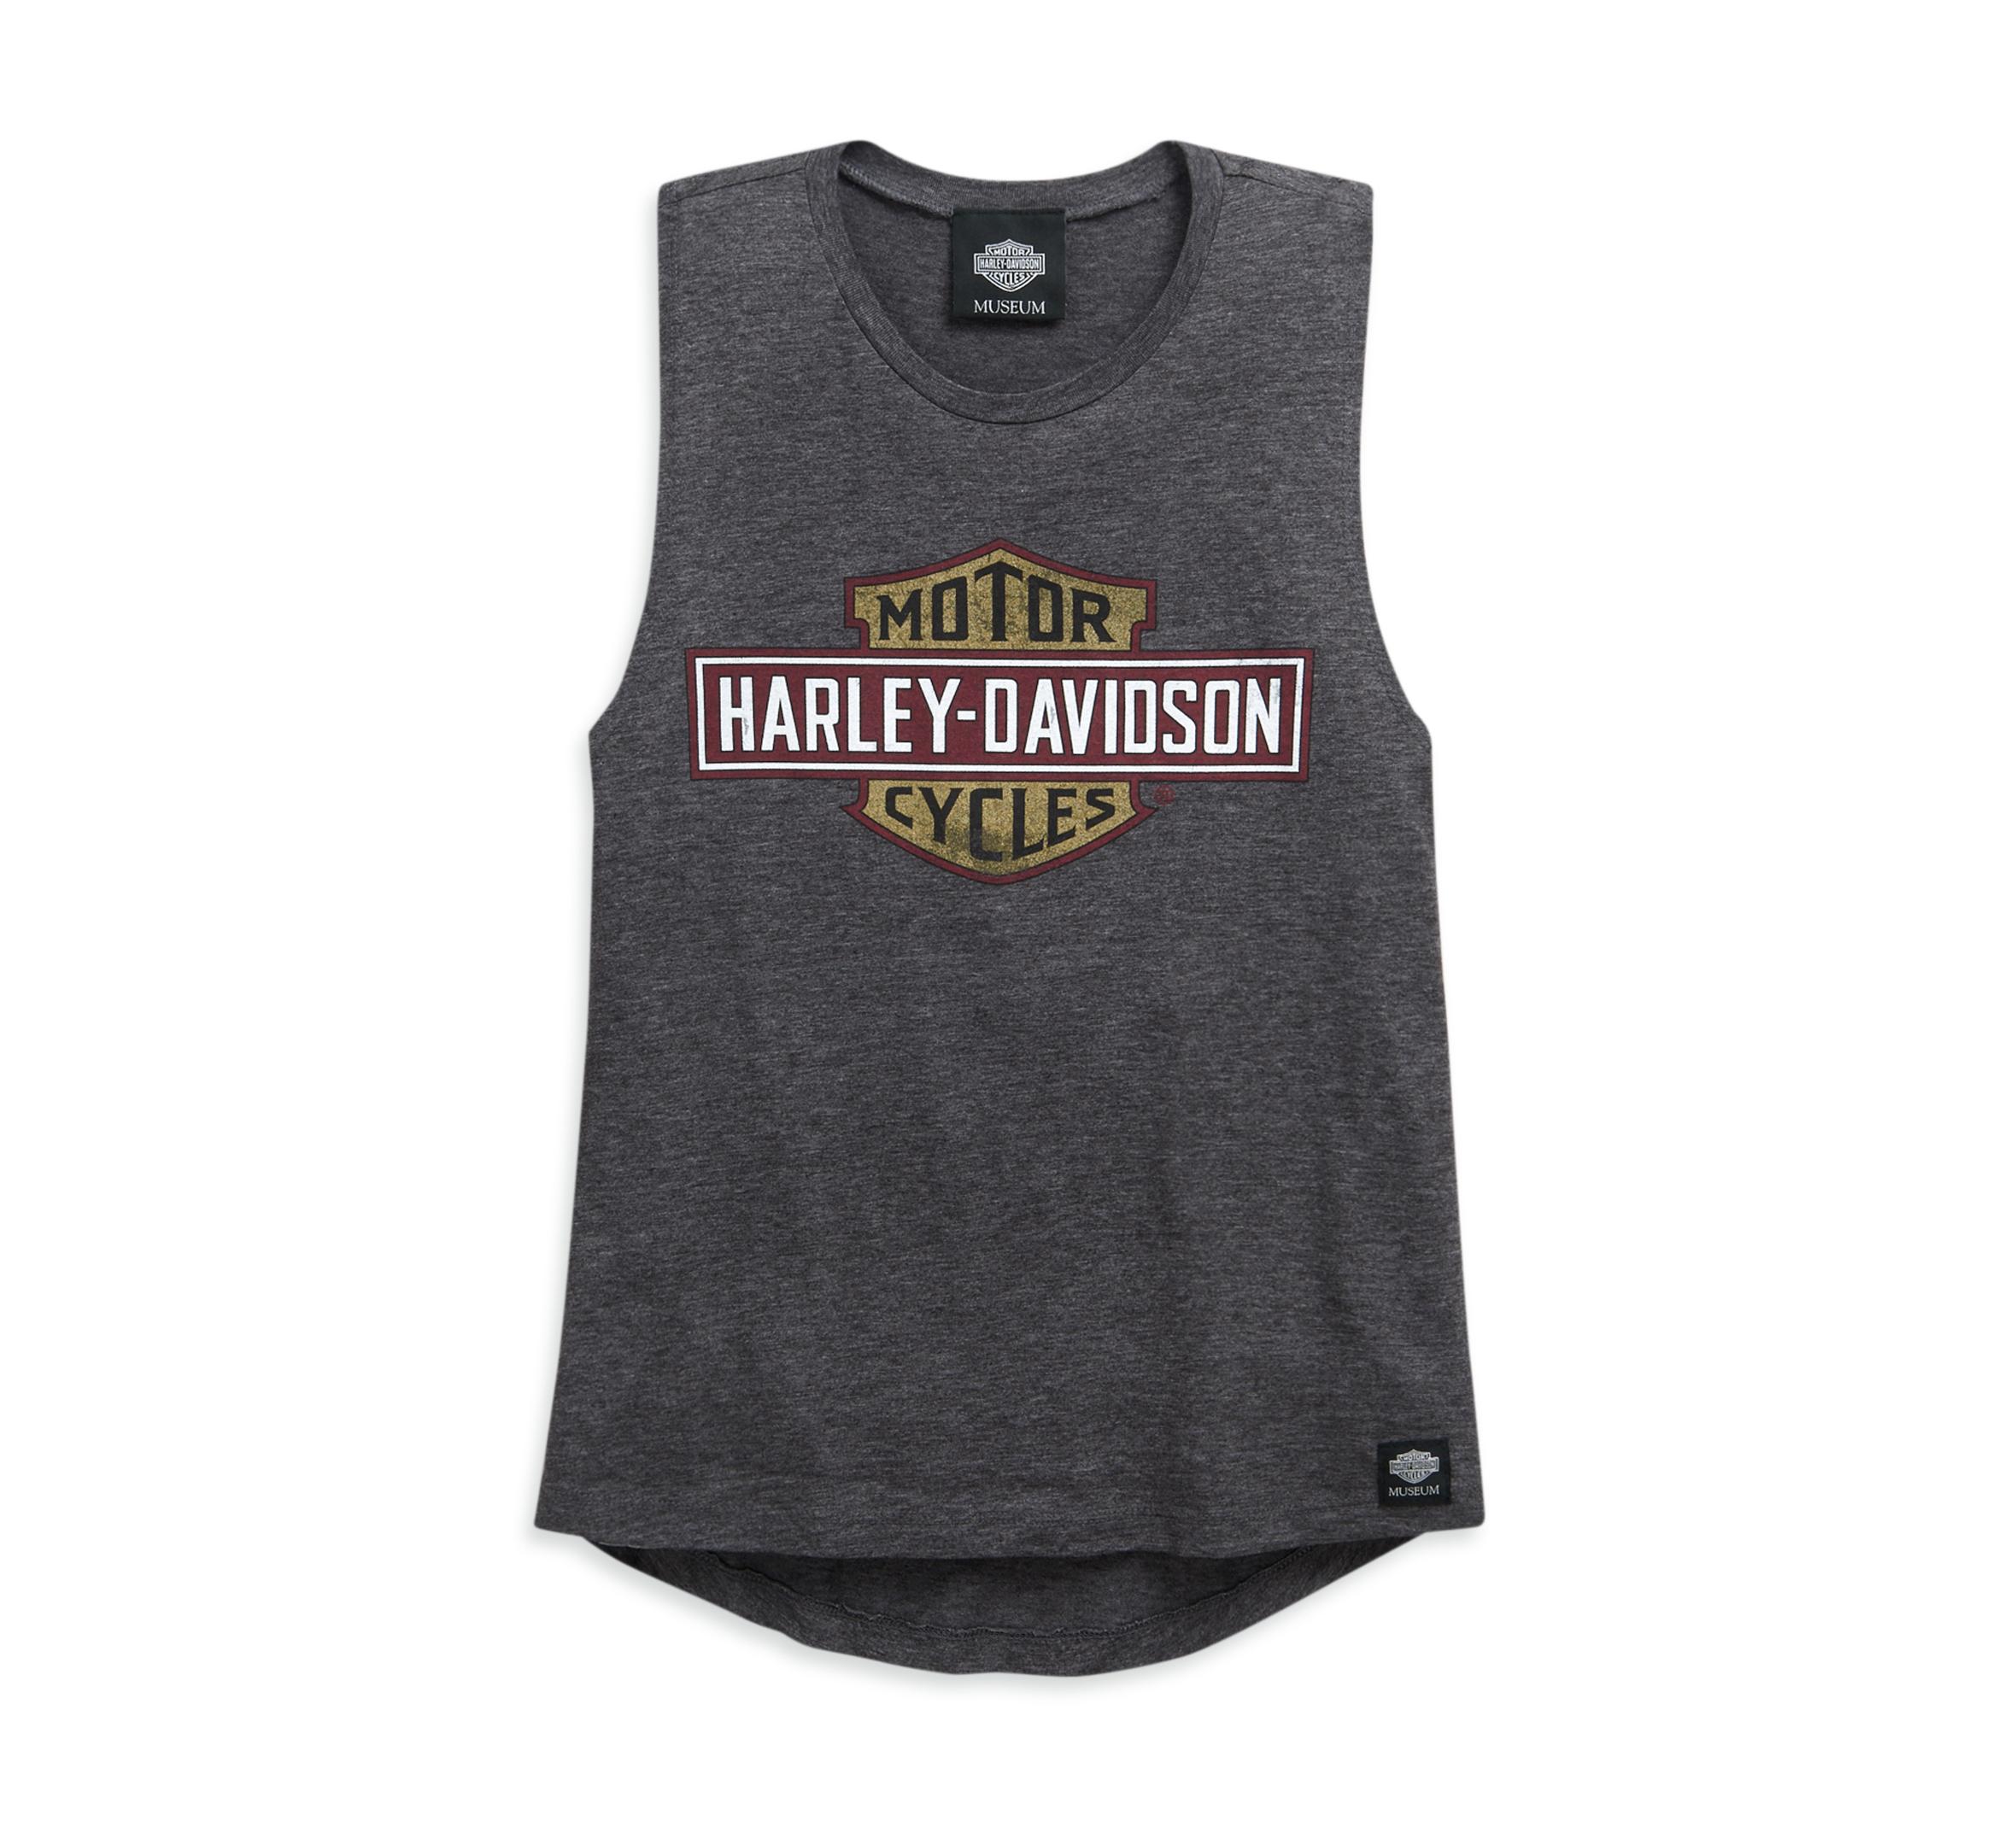 New Harley Davidson Women/'s Ladies/' Plaid Sleeveless Tank Top